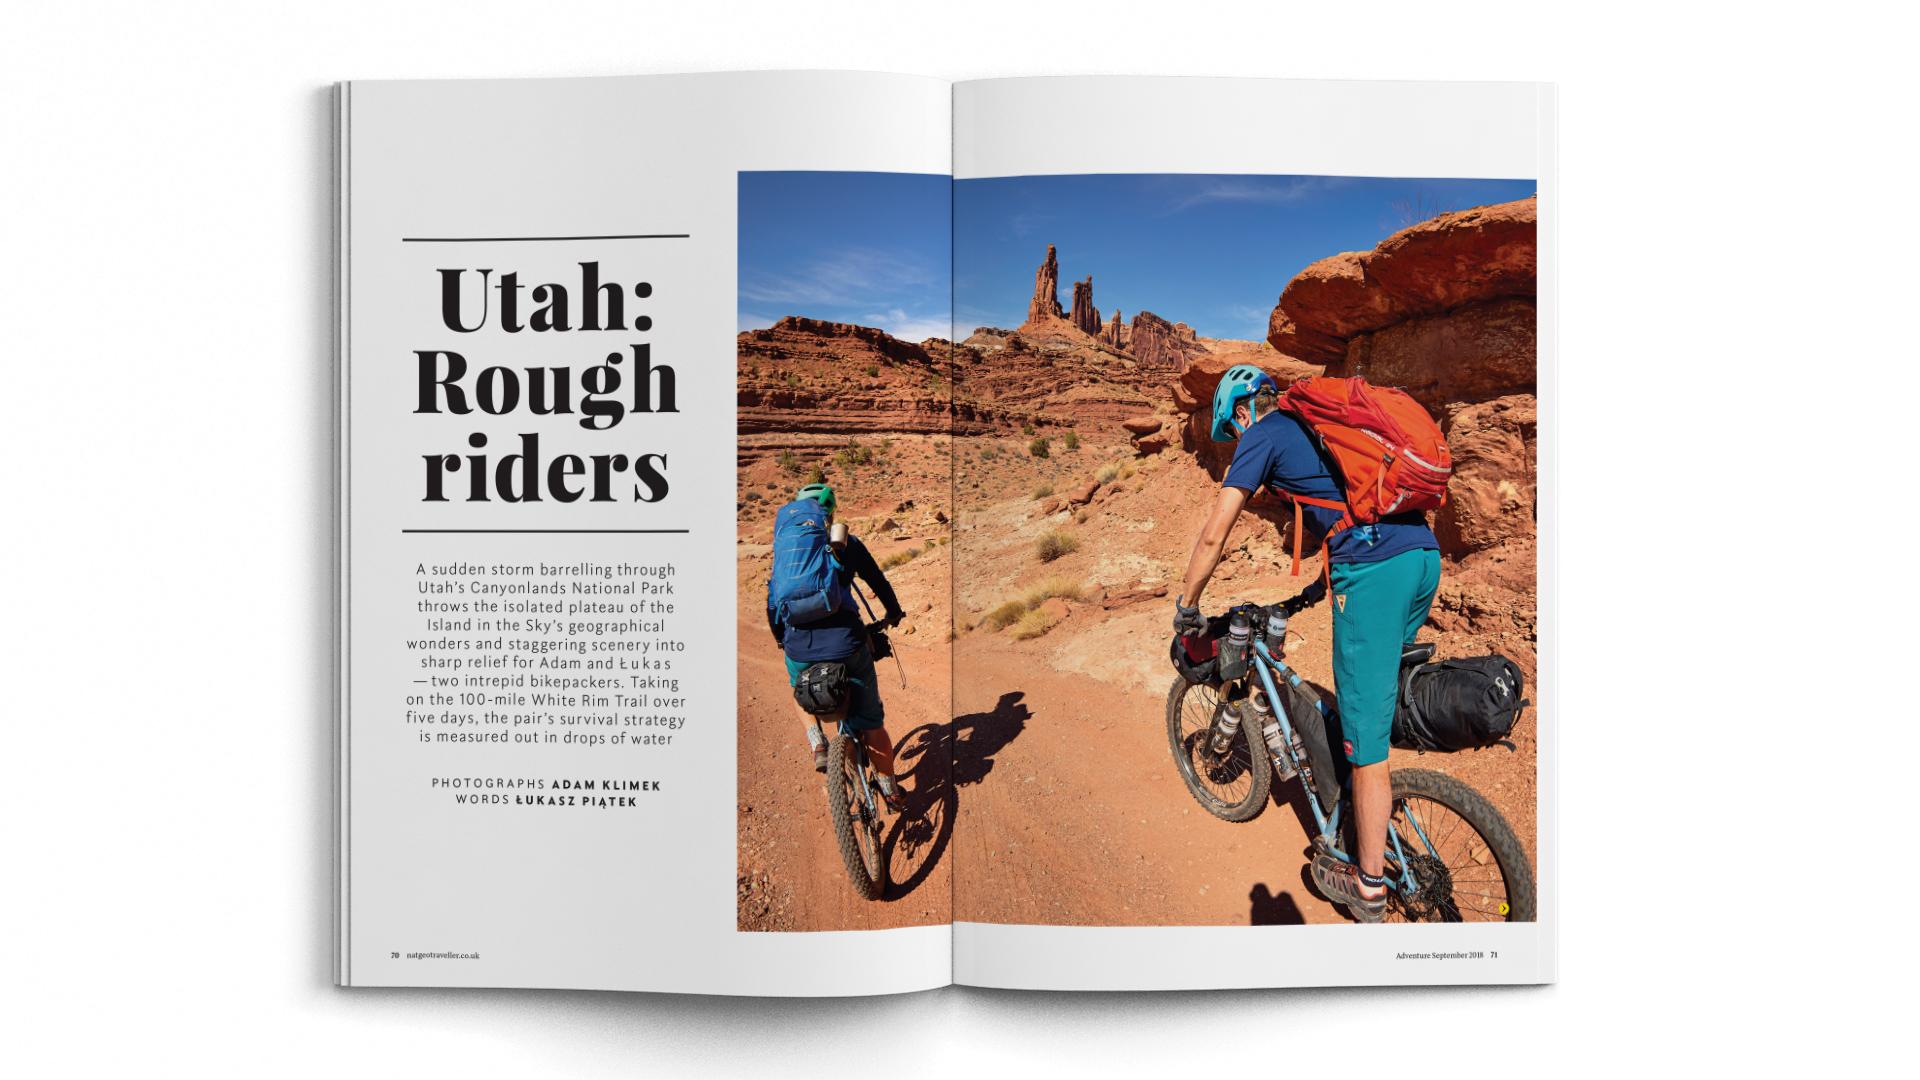 A4-Magazine-DPS-NGT-ADV-Utah-1